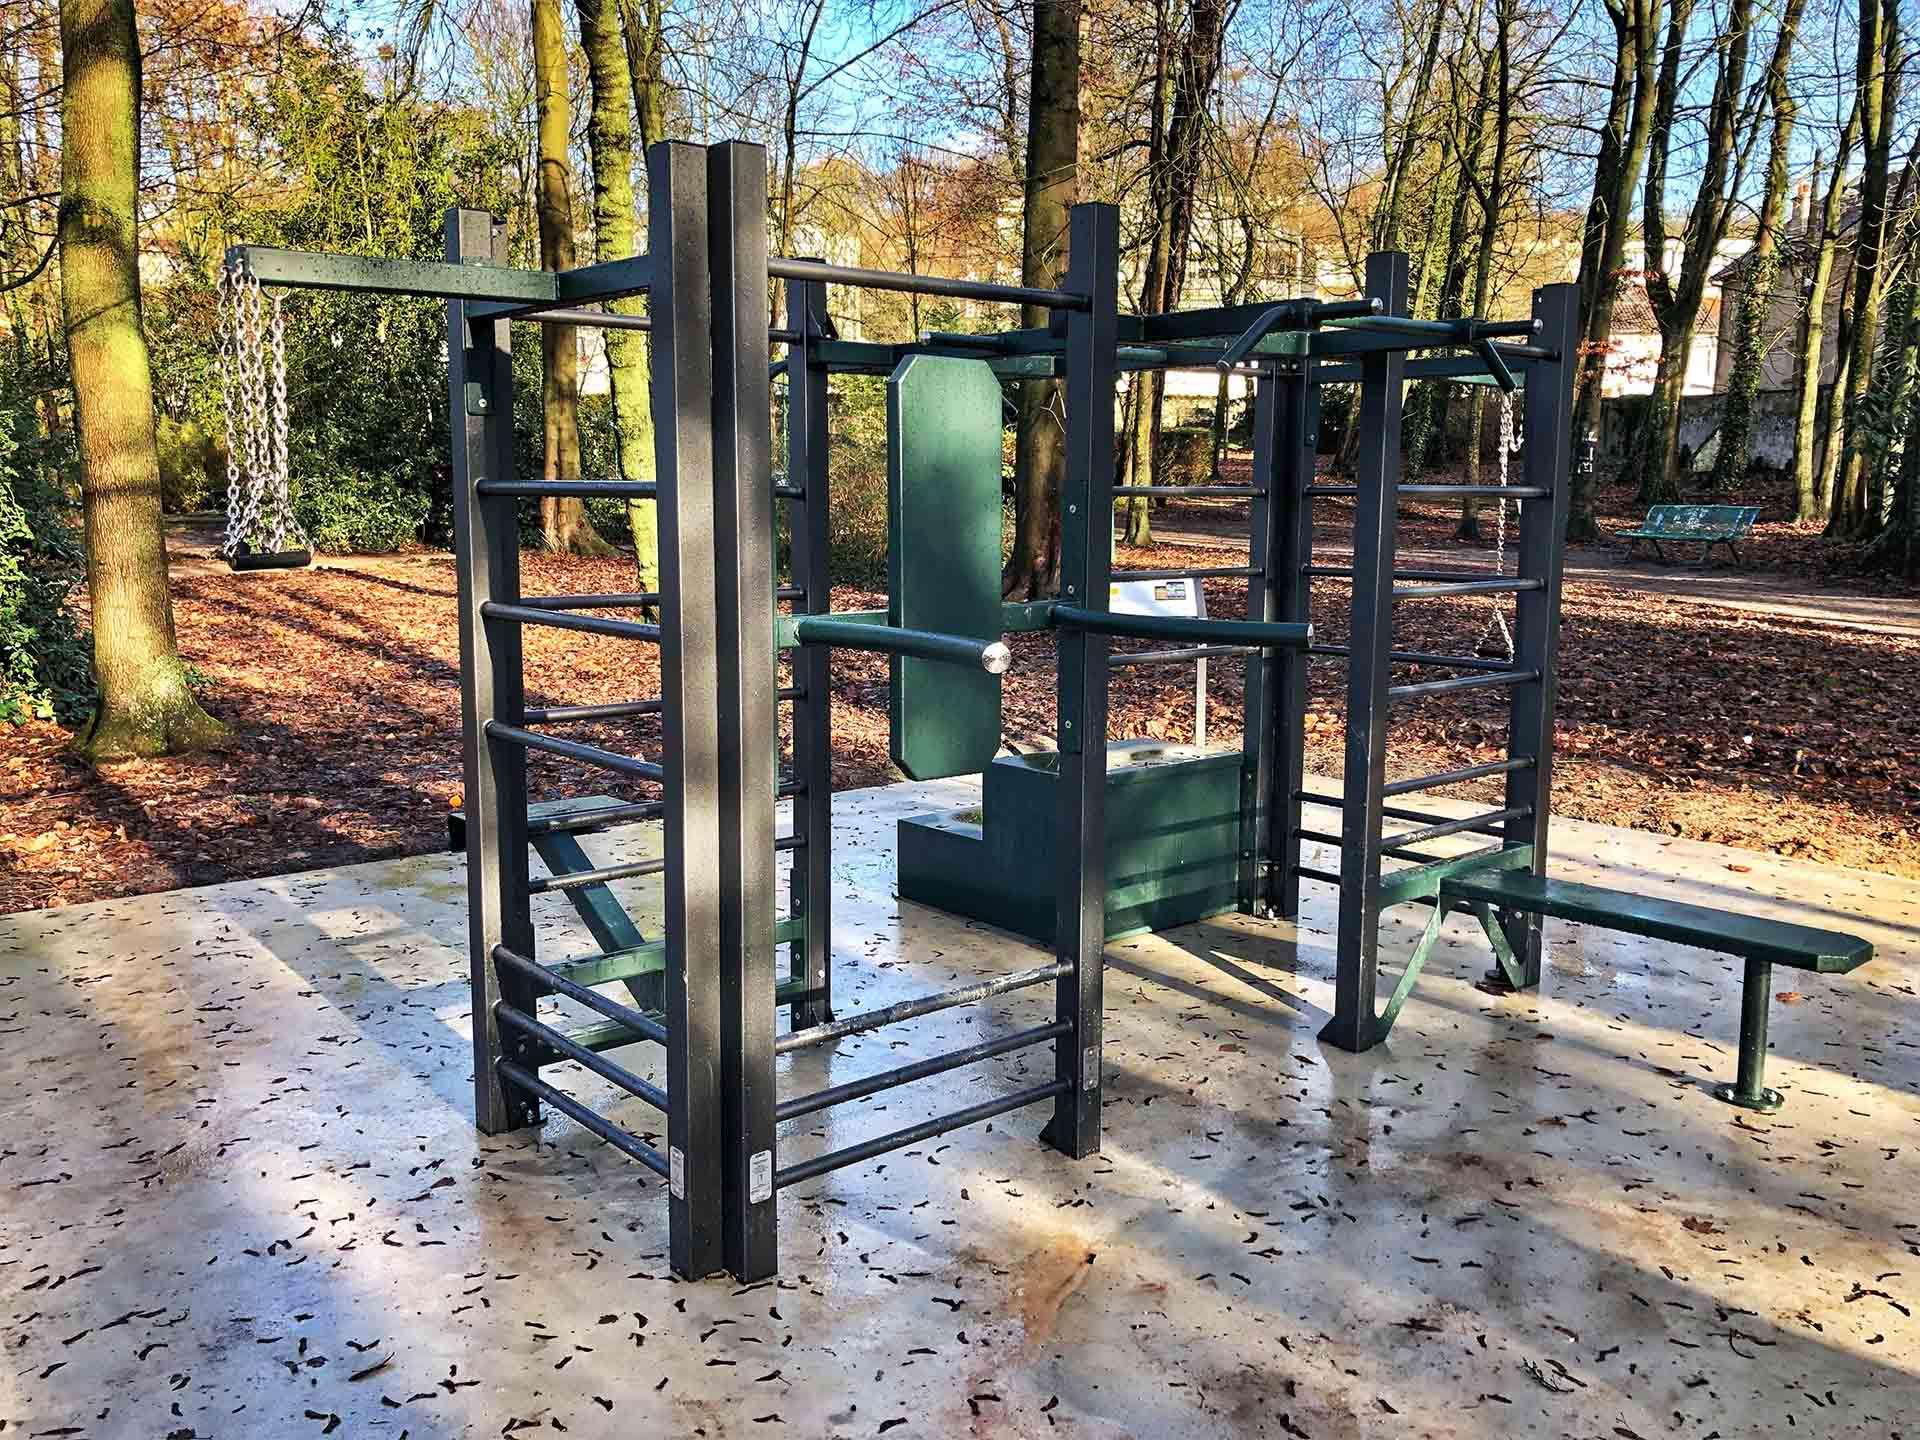 http://95.telif.tv/2019/01/29/une-station-fitness-connectee-en-libre-acces-a-taverny/